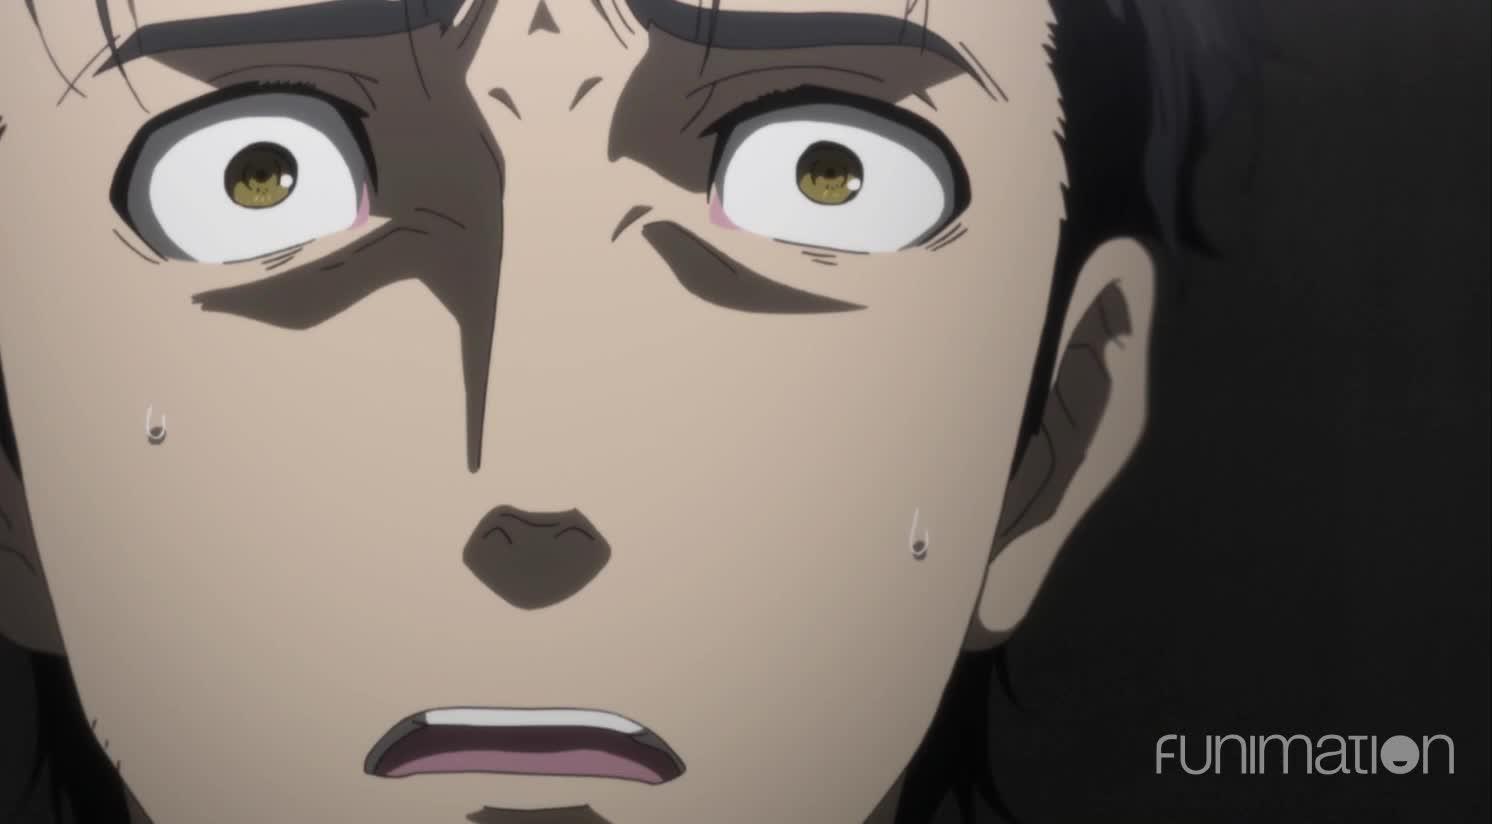 Funimation, Steins;Gate, Steins;Gate Episode 6, SteinsGate, anime, sci-fi, scifi, going pale GIFs